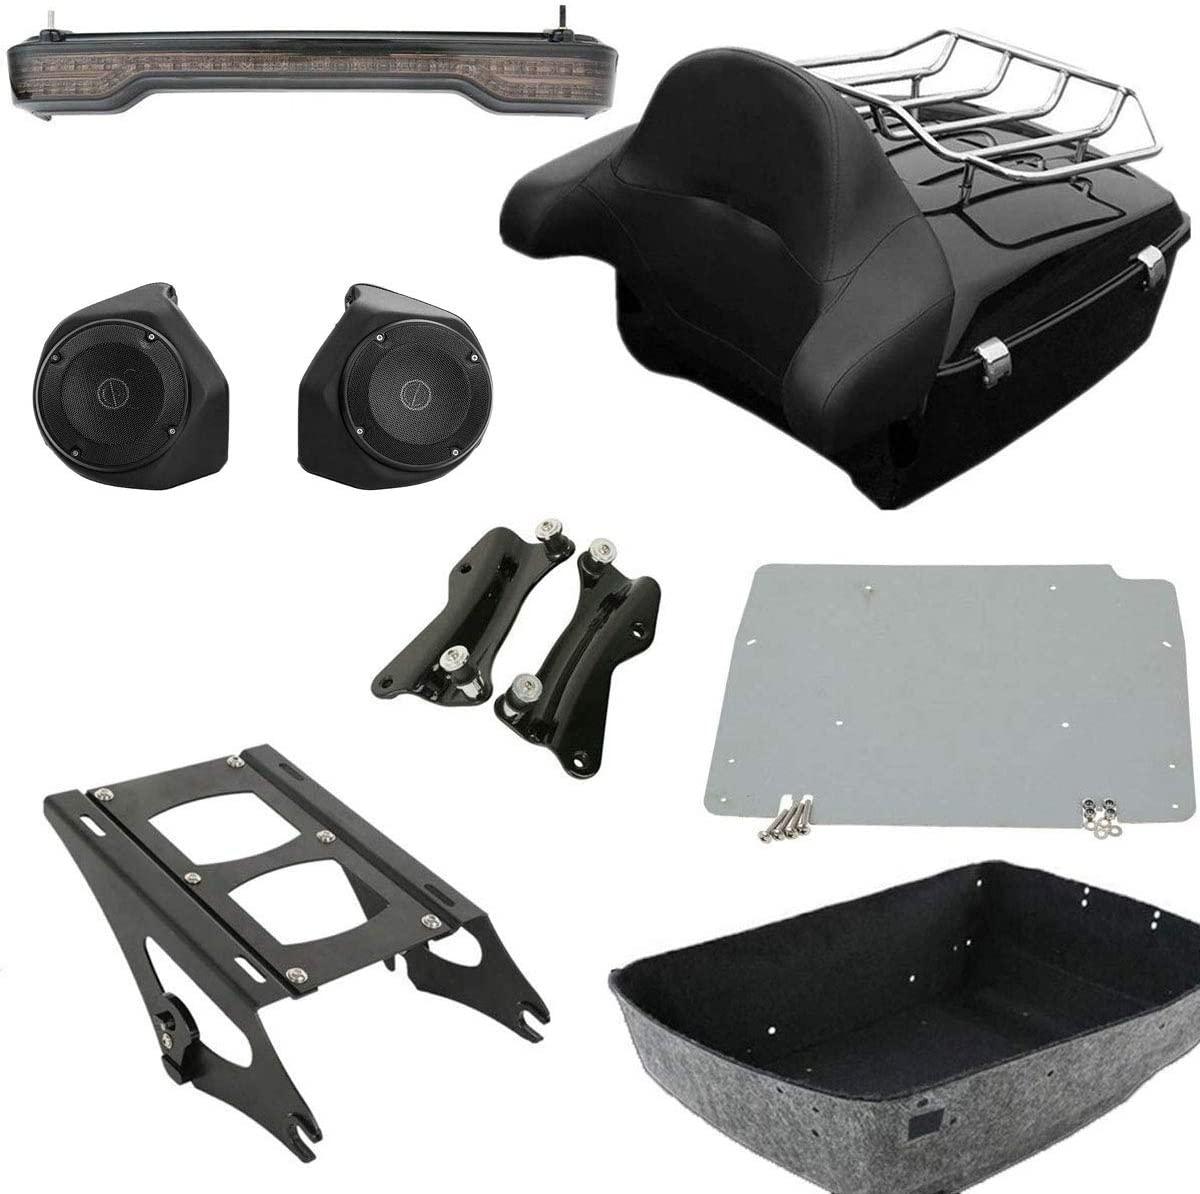 TCMT King Tour Pack Trunk Backrest 2 Up Mounting Rack Luggage Rack Base Metal Rear Speaker LED Brake Turn Tail Light Docking Hardware Kits Fits For Harley Touring 2014-2020 (Style D)